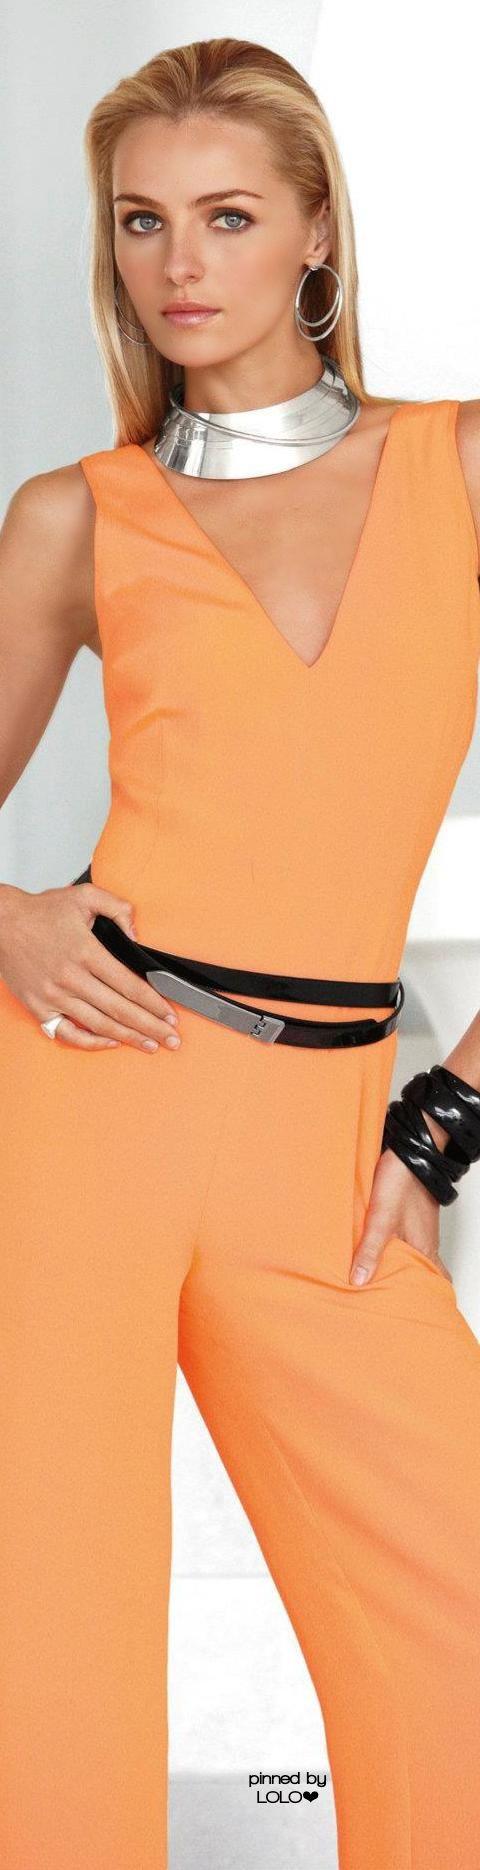 Valentina Zelyaeva for Ralph Lauren Casual in Summer Peach, 2015  http://georgiapapadon.com/